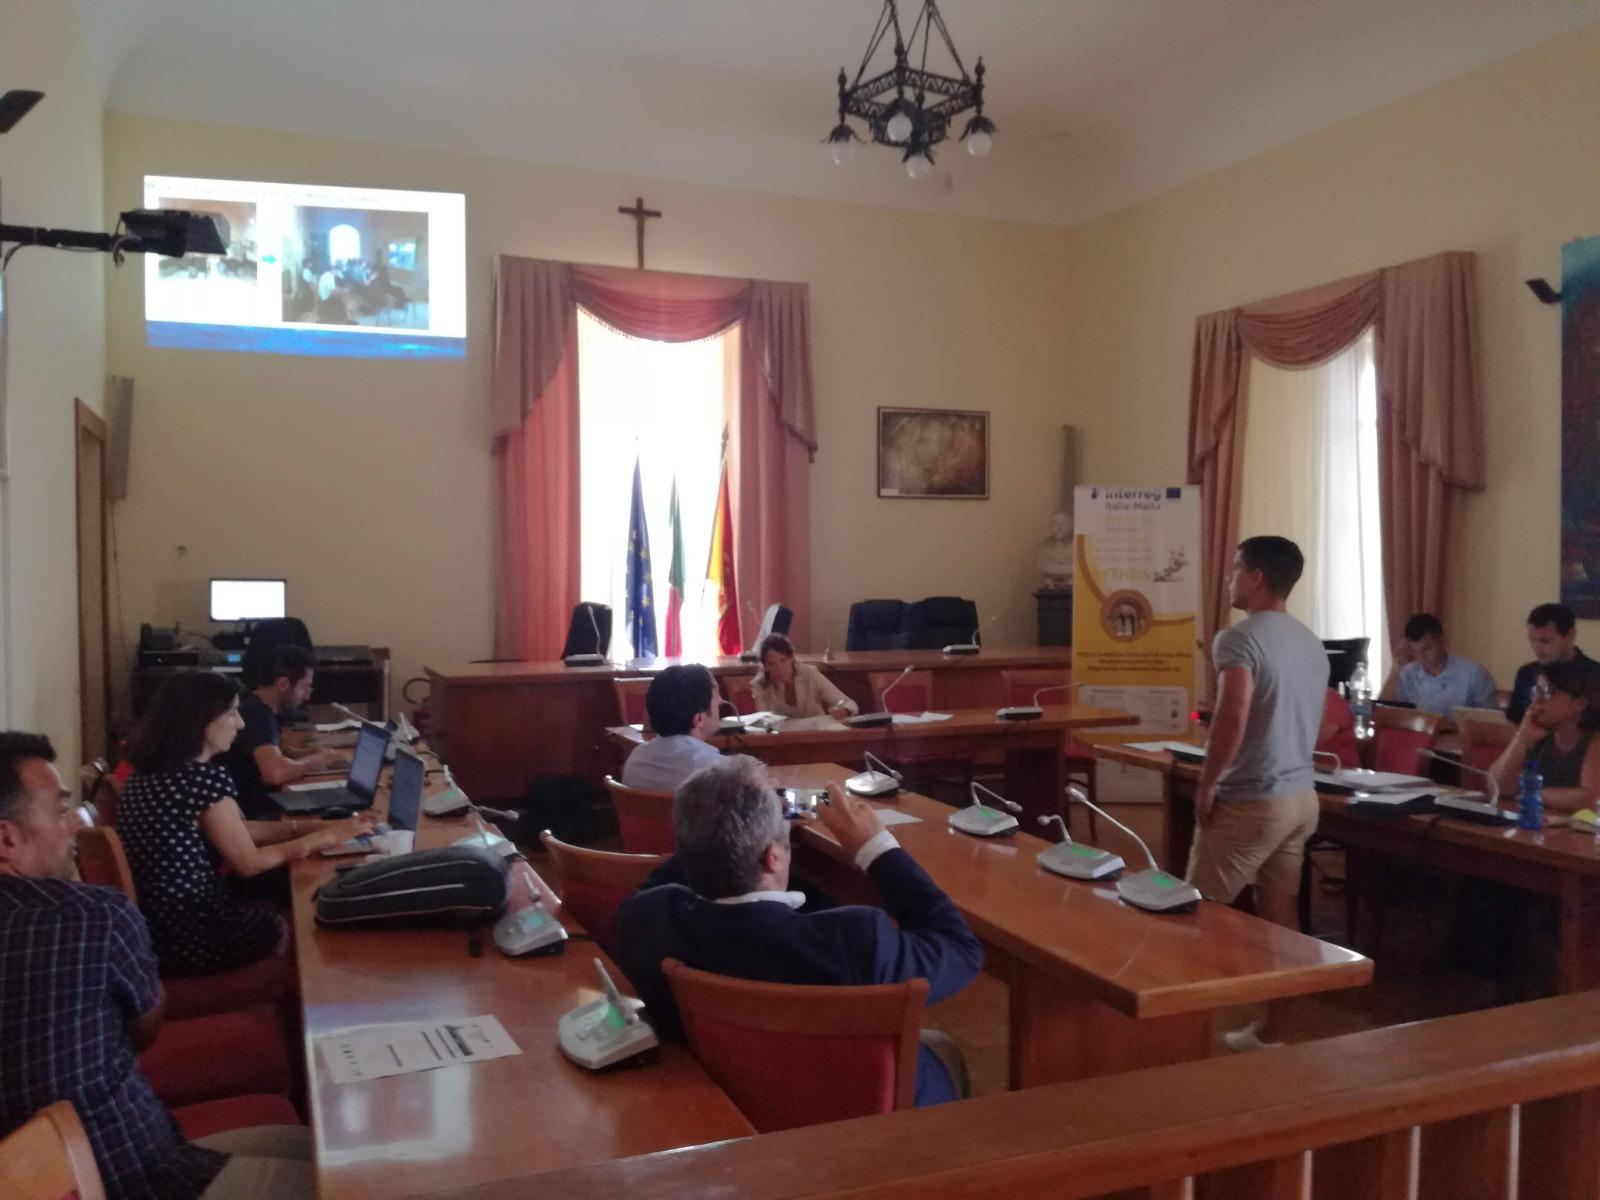 Bythos - Kick-off meeting, Lipari